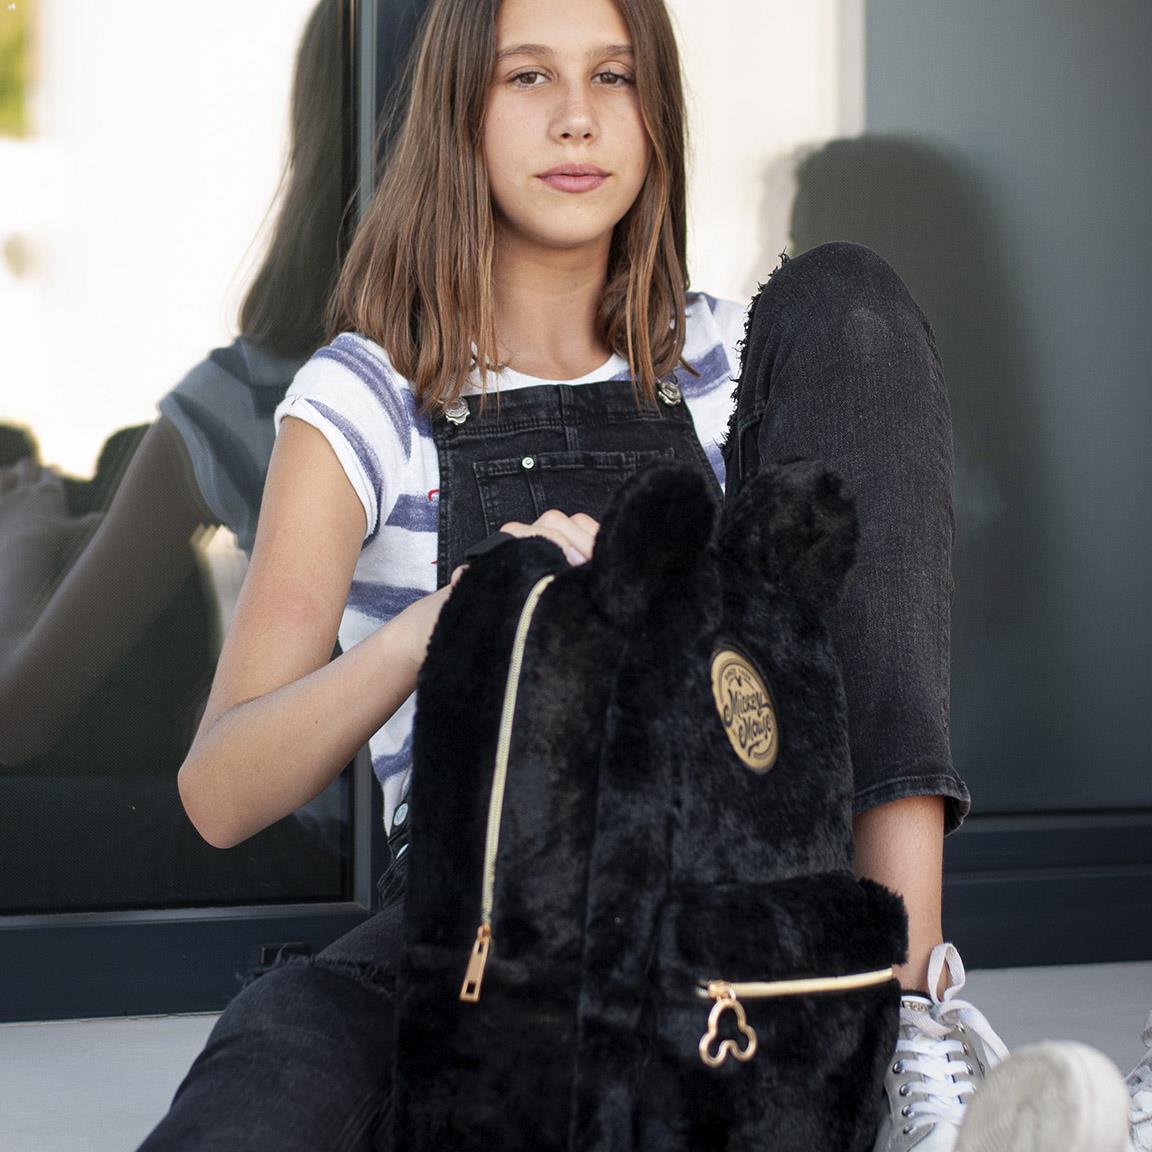 CRD - Mini mochila negra Mickey